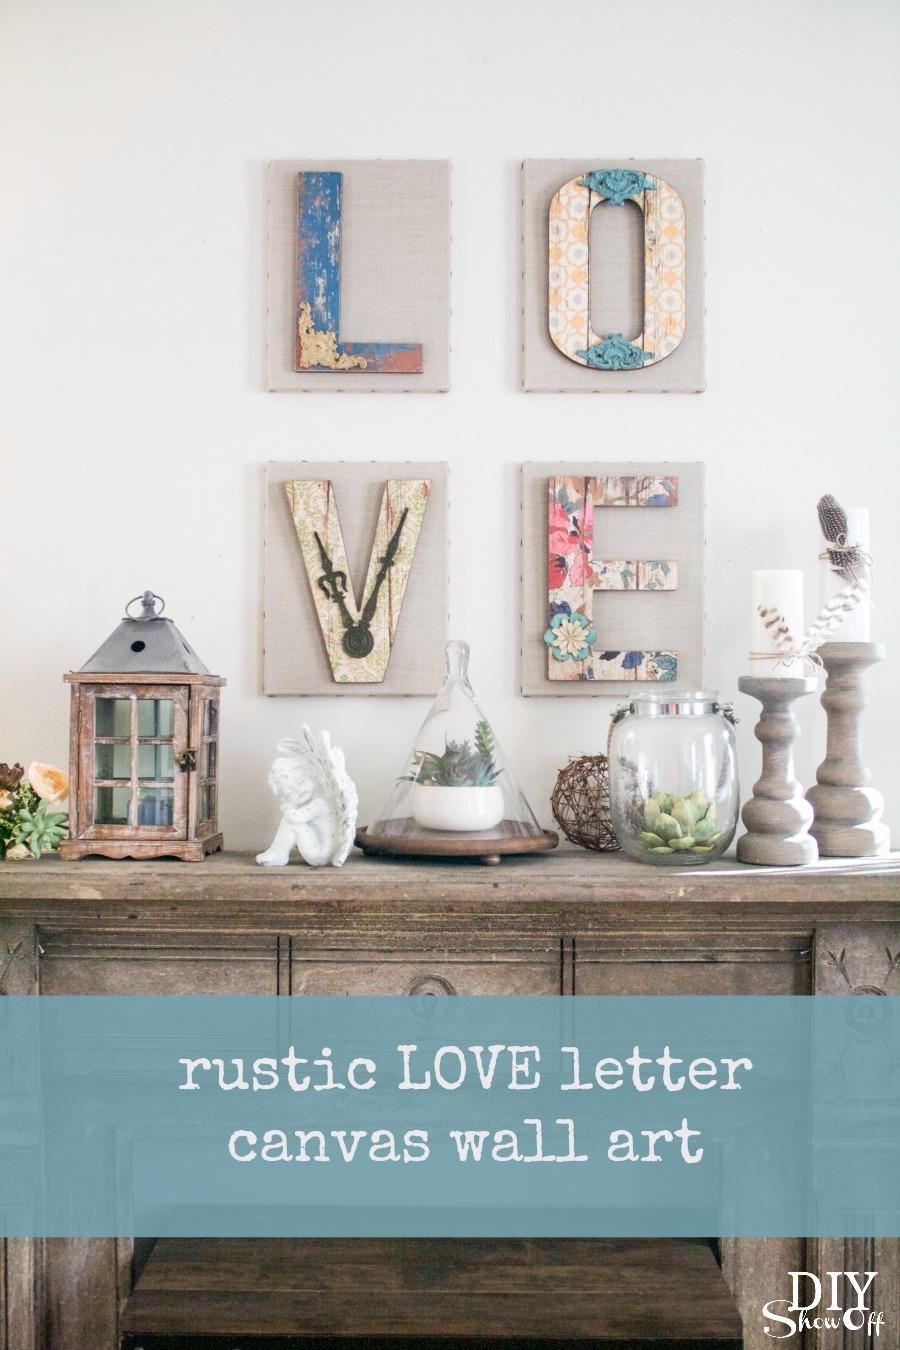 LOVE wall art canvases tutorial  DIY Show Off   DIY